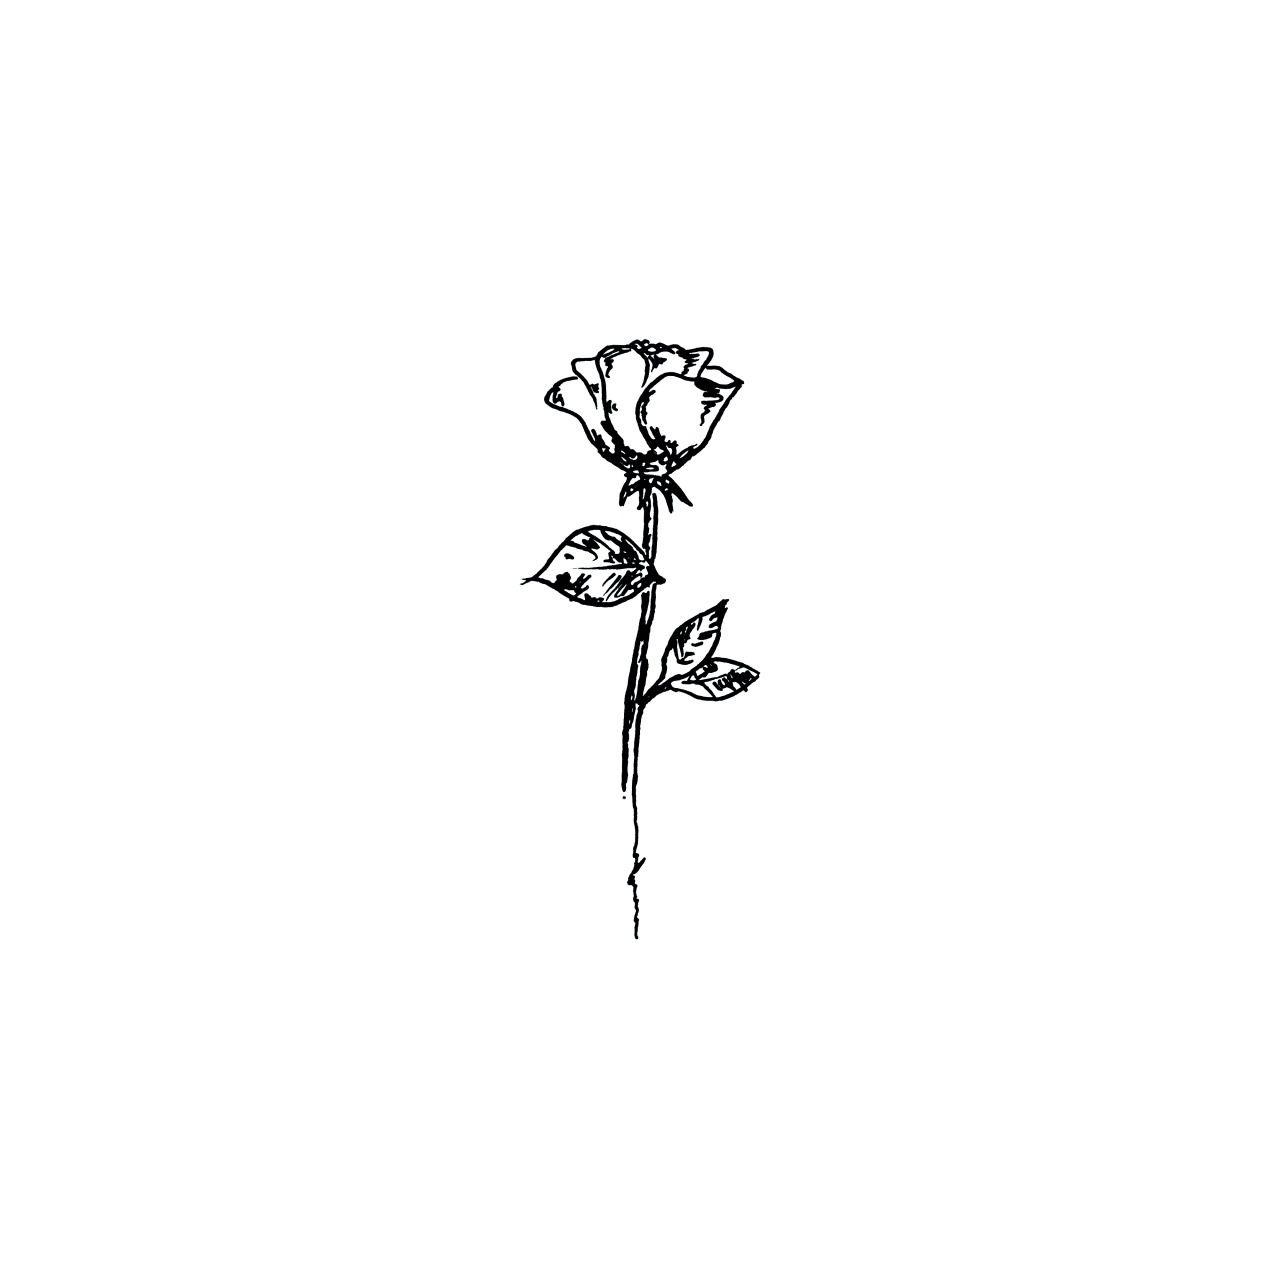 Rose Wildflower Minimalsit Tattoos Rose Tattoos Body Art Tattoos